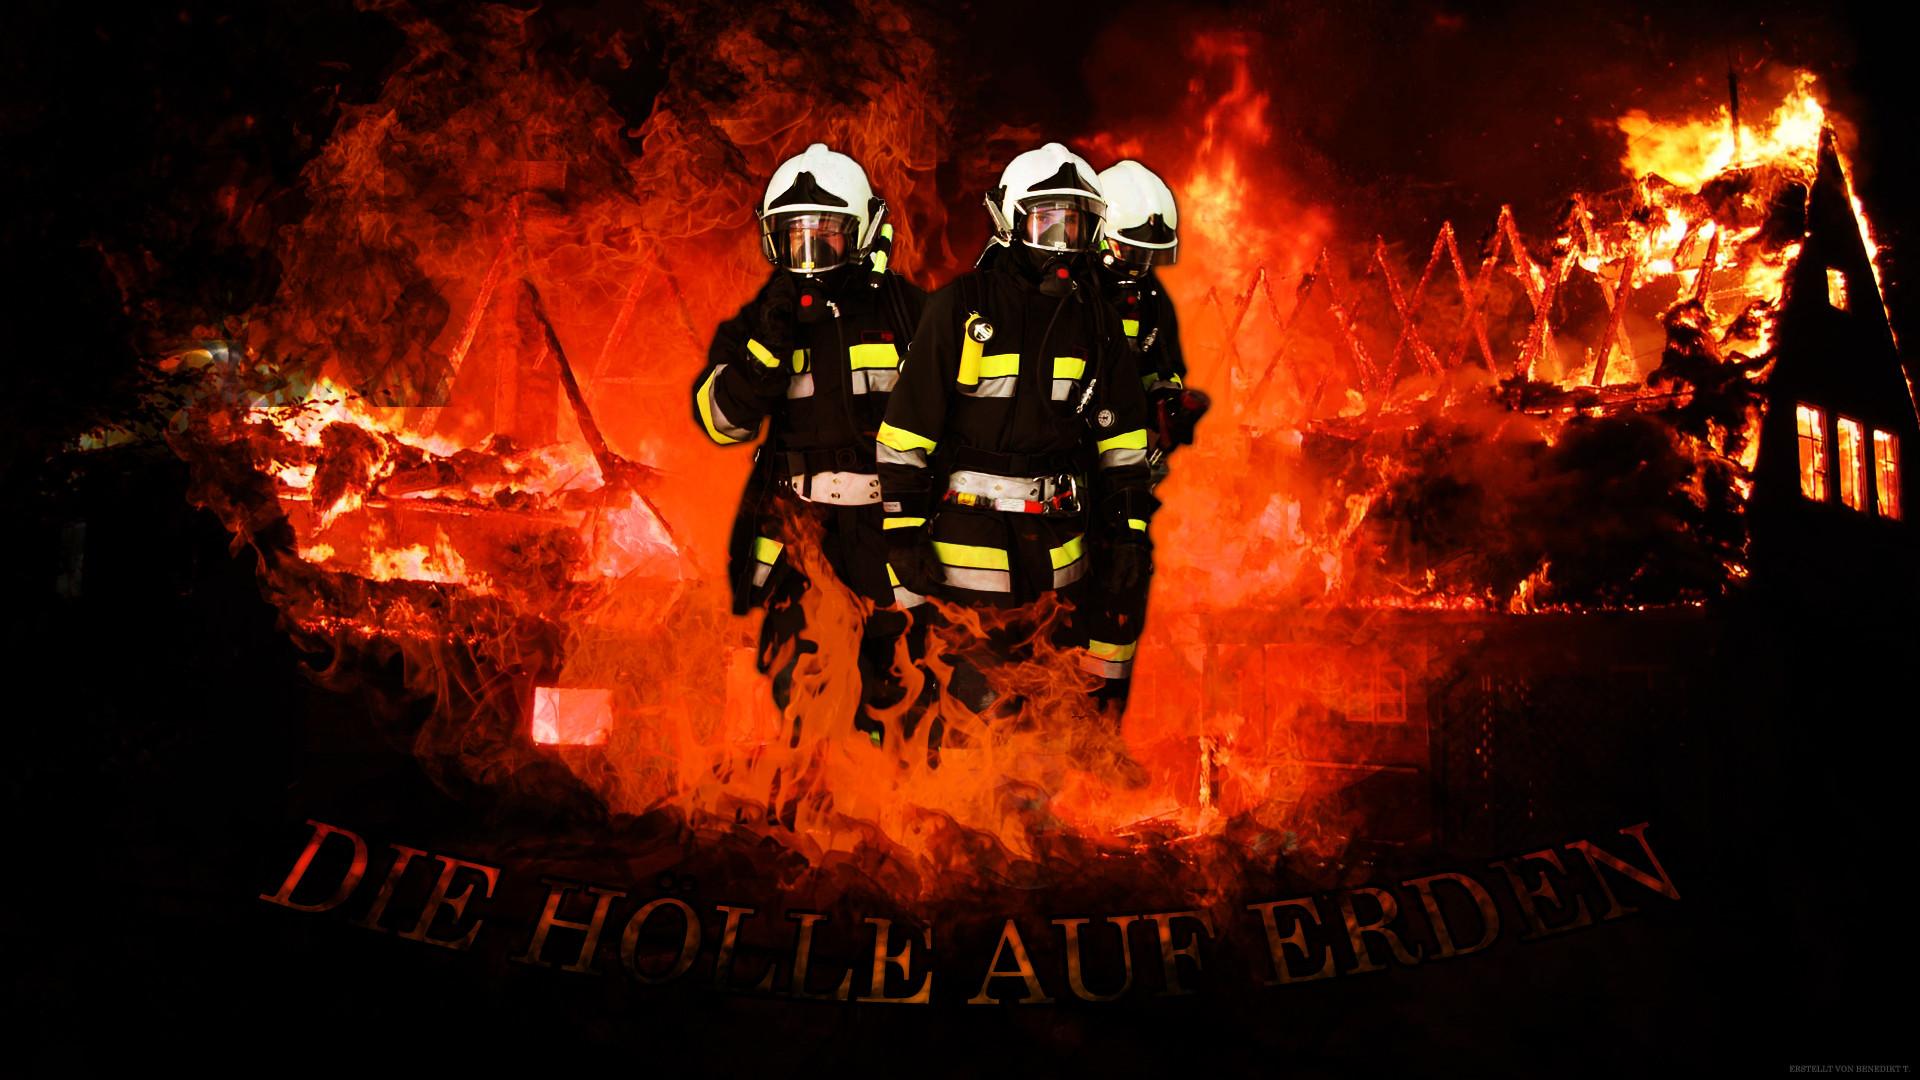 Res: 1920x1080, Firefighter Germany Wallpaper Feuerwehr by DeNite93